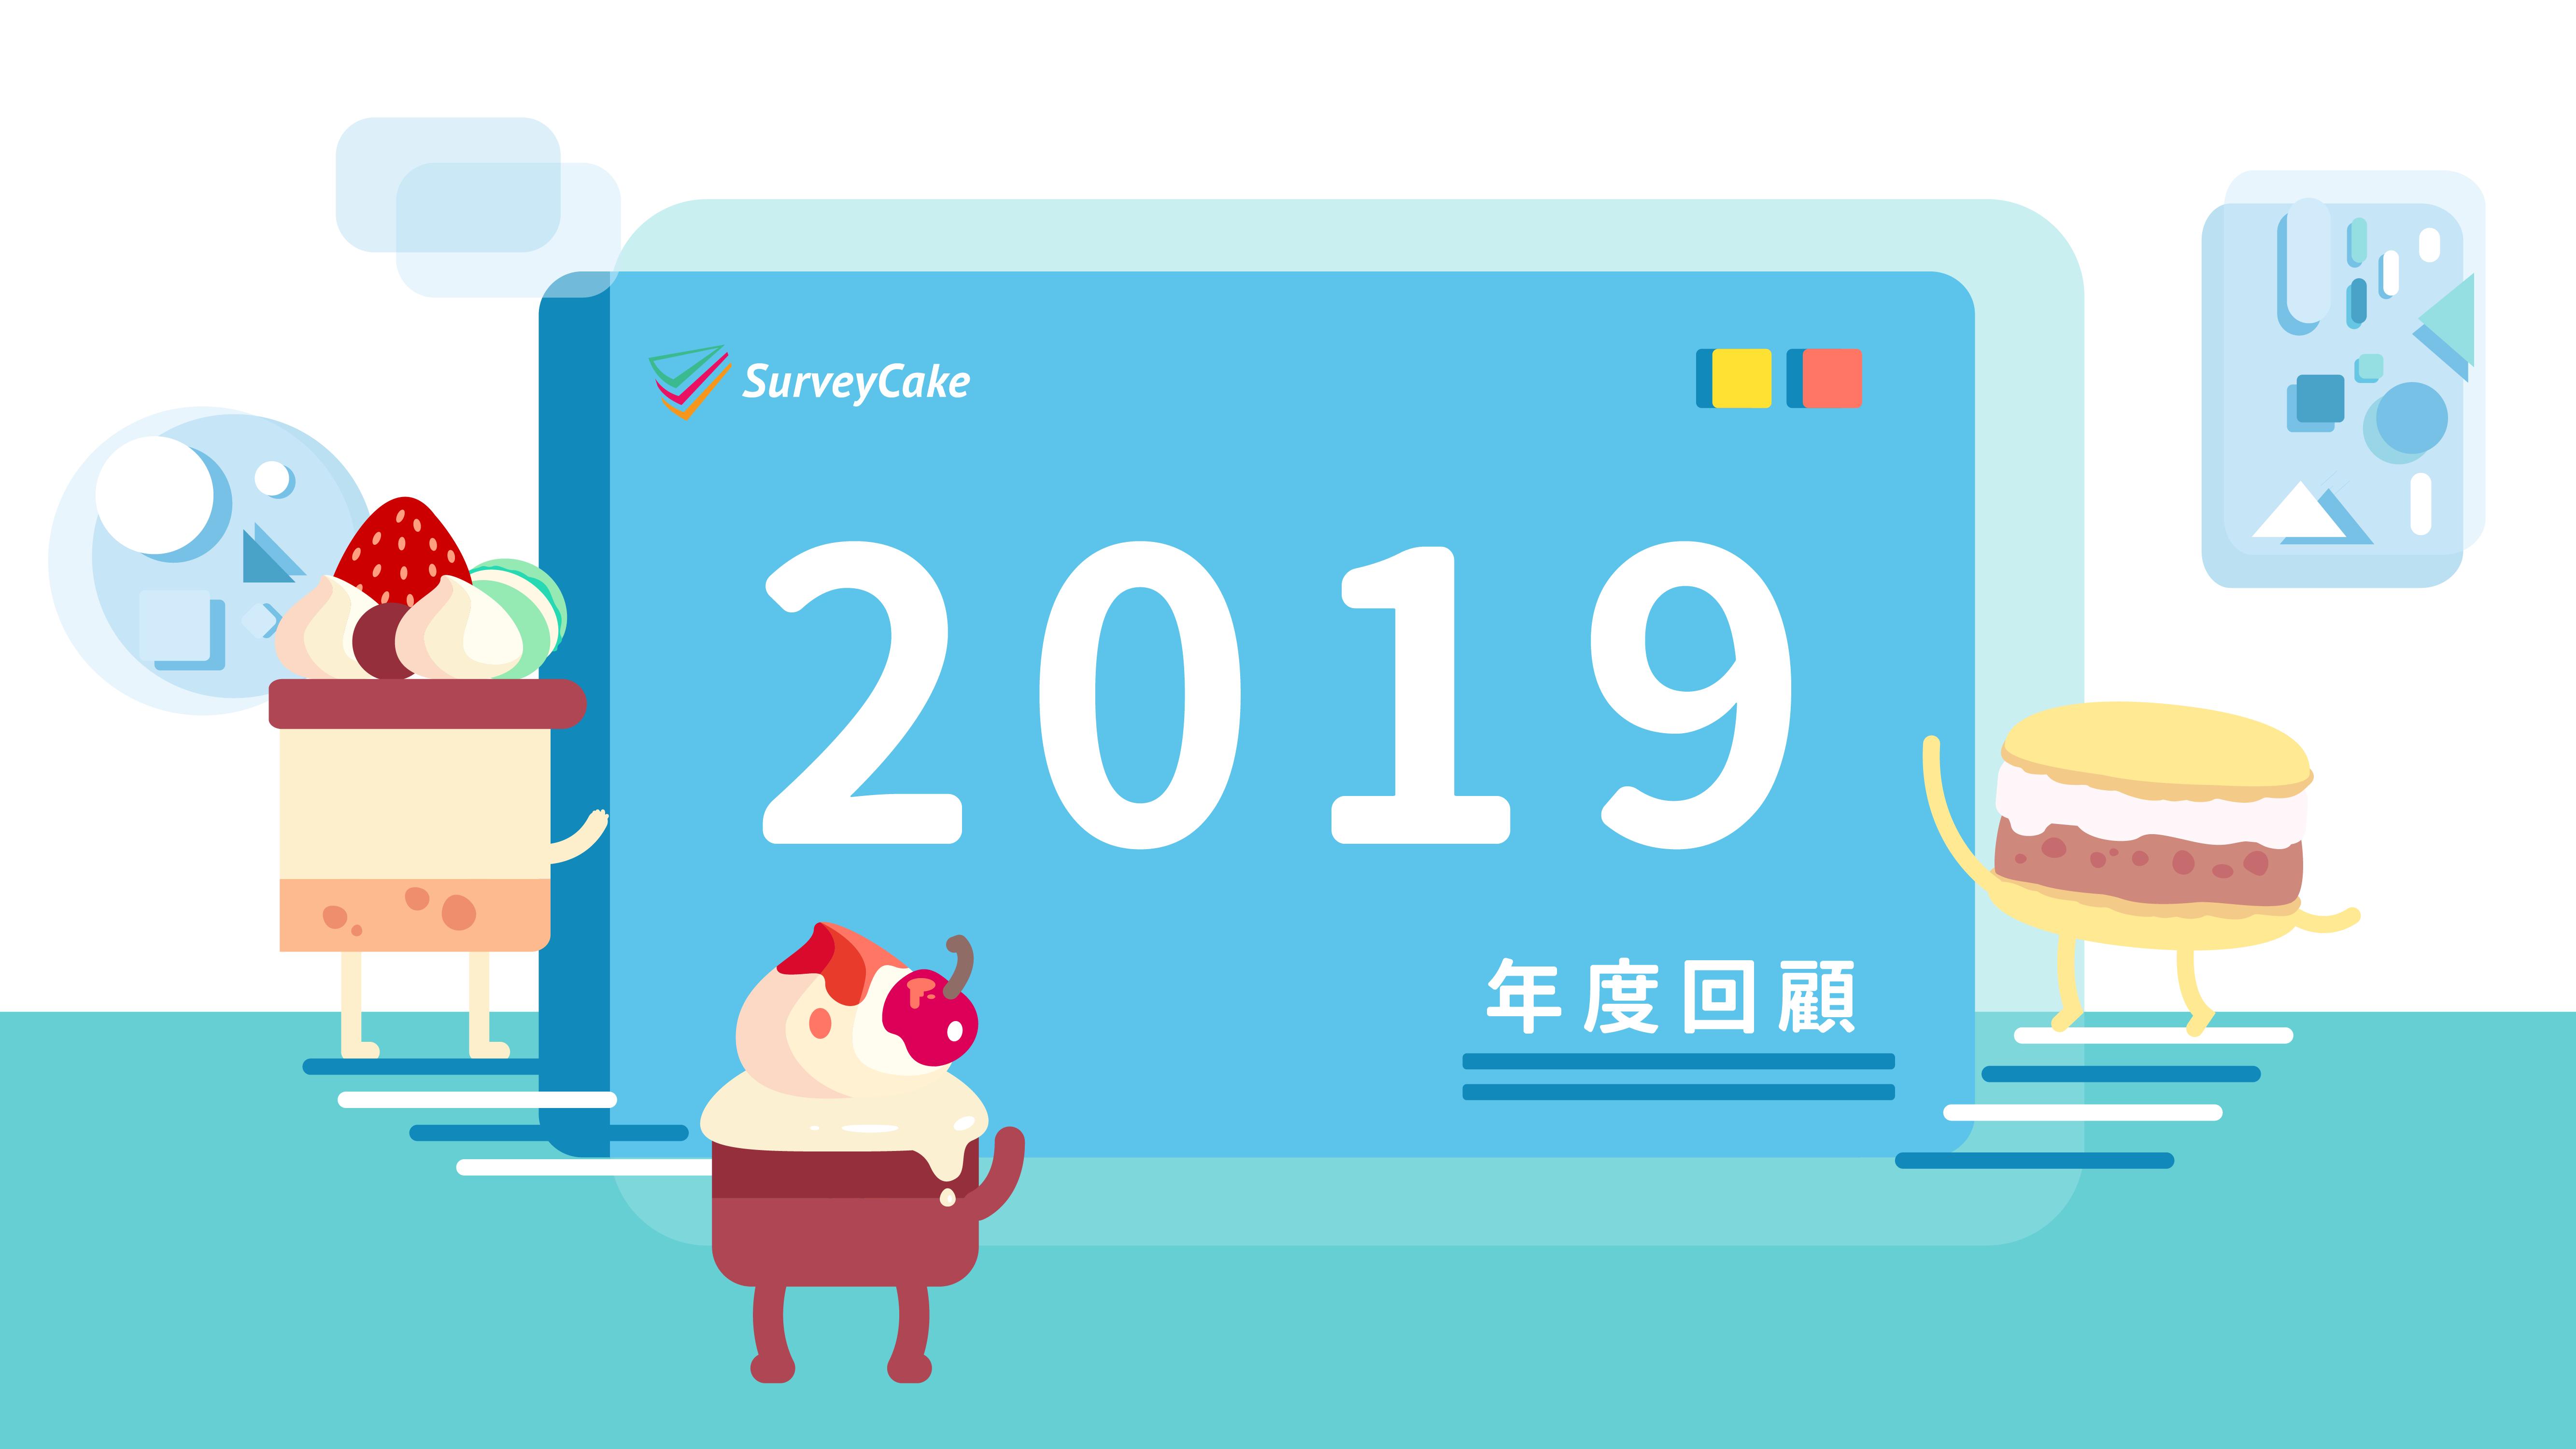 2019 SurveyCake 年度回顧,成長歷史大揭密